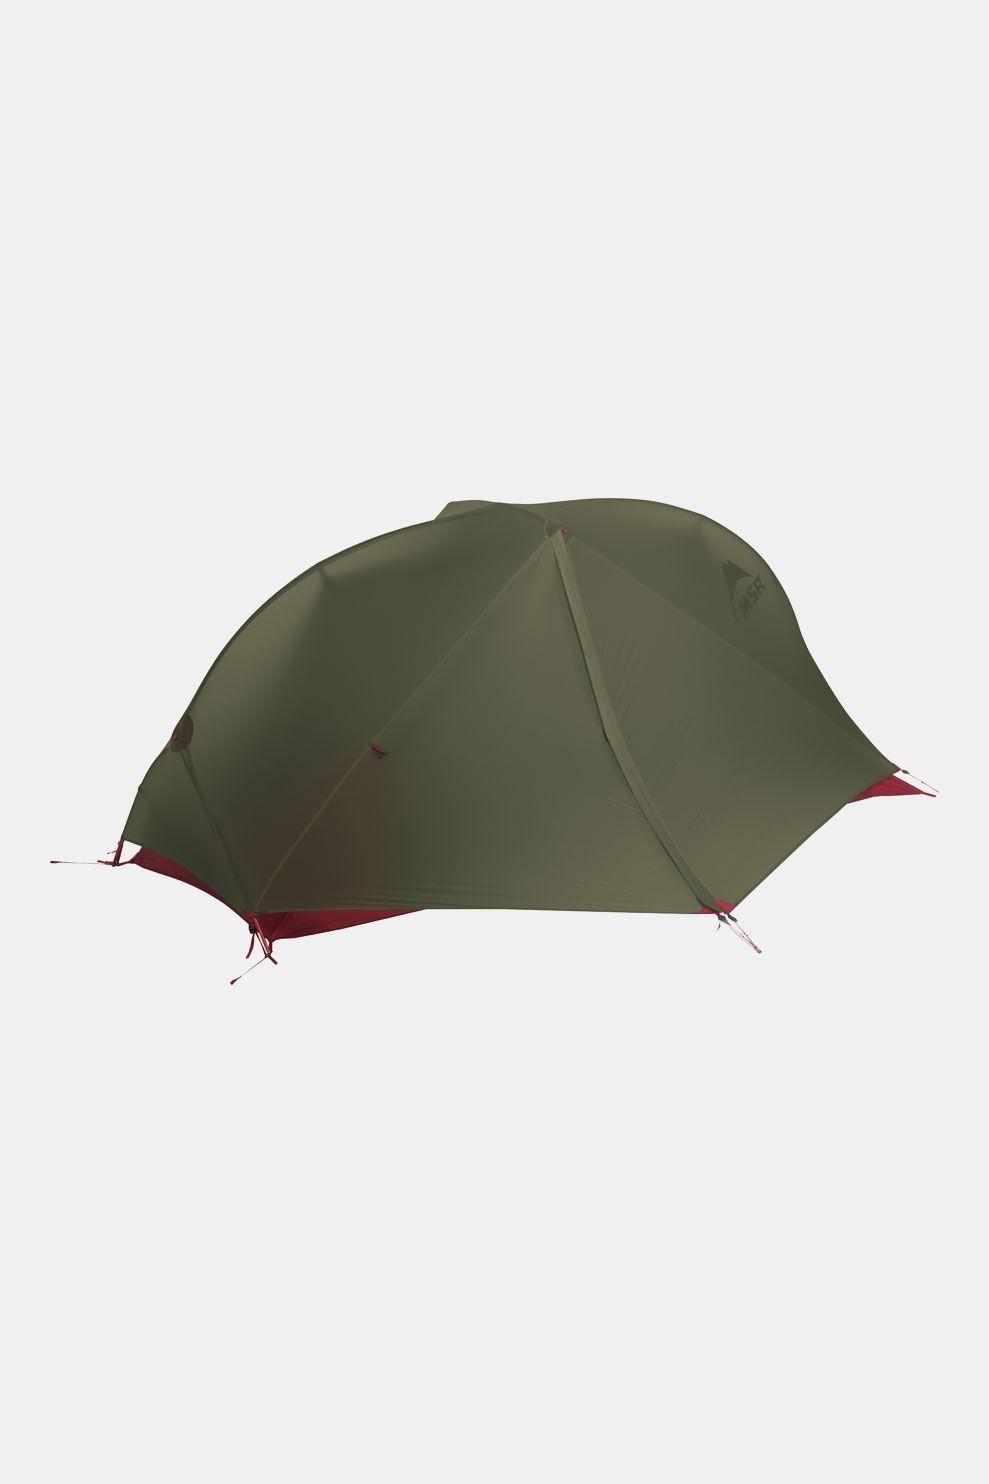 MSR FreeLite 1 Tent Hybride tent Middengroen